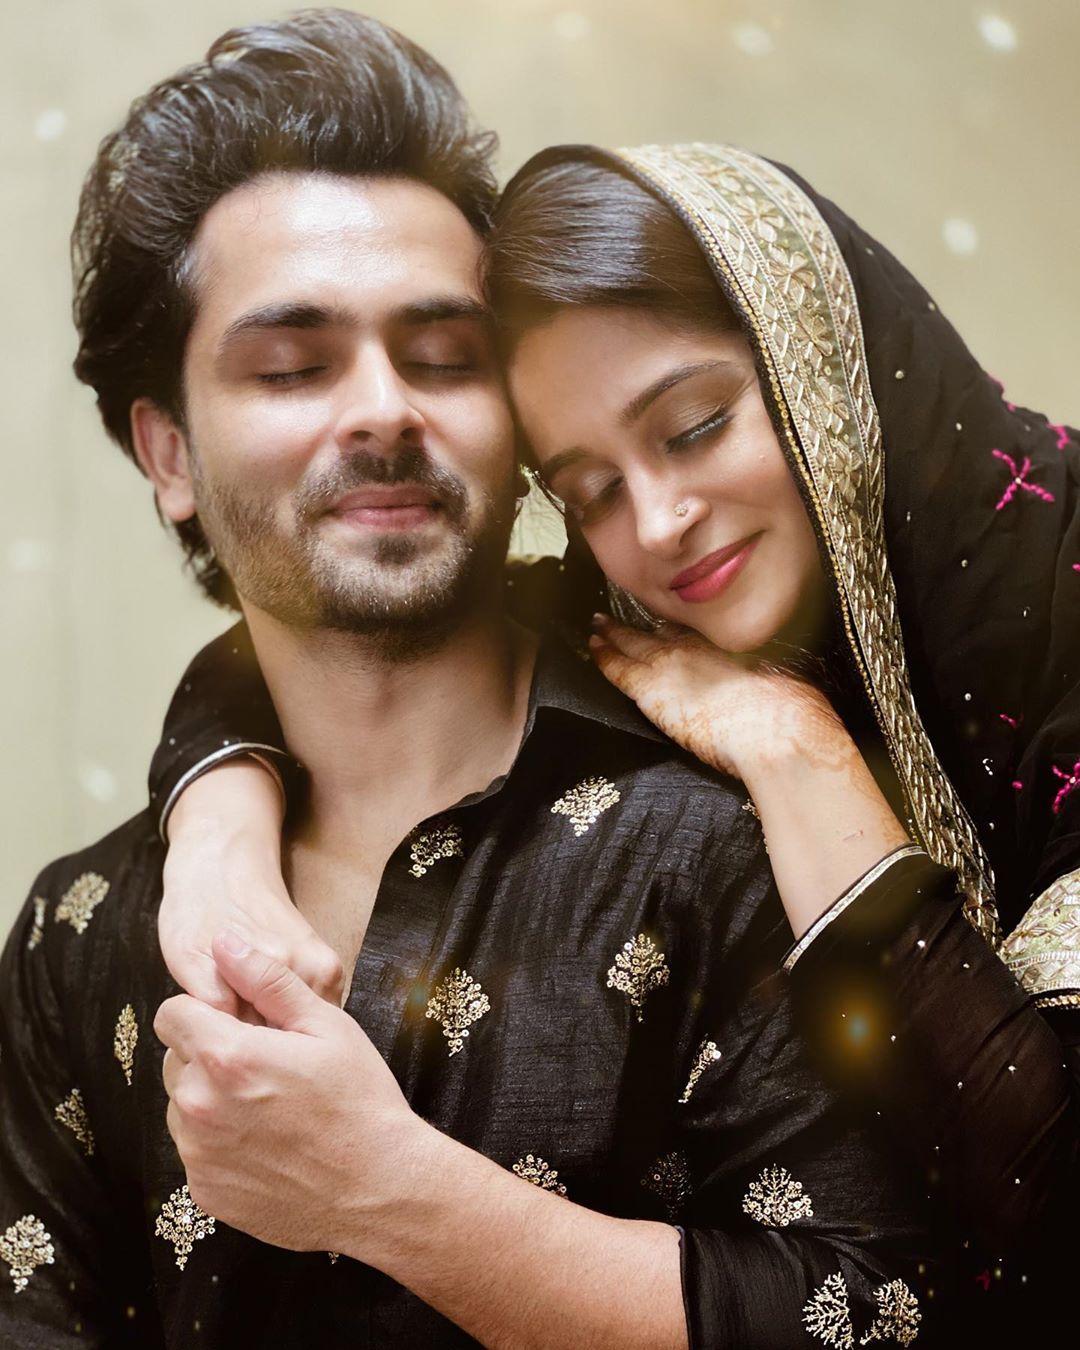 Dipika Kakar &  Shoaib Ibrahim Share ADORABLE PICS From Their Eid Celebrations With Family